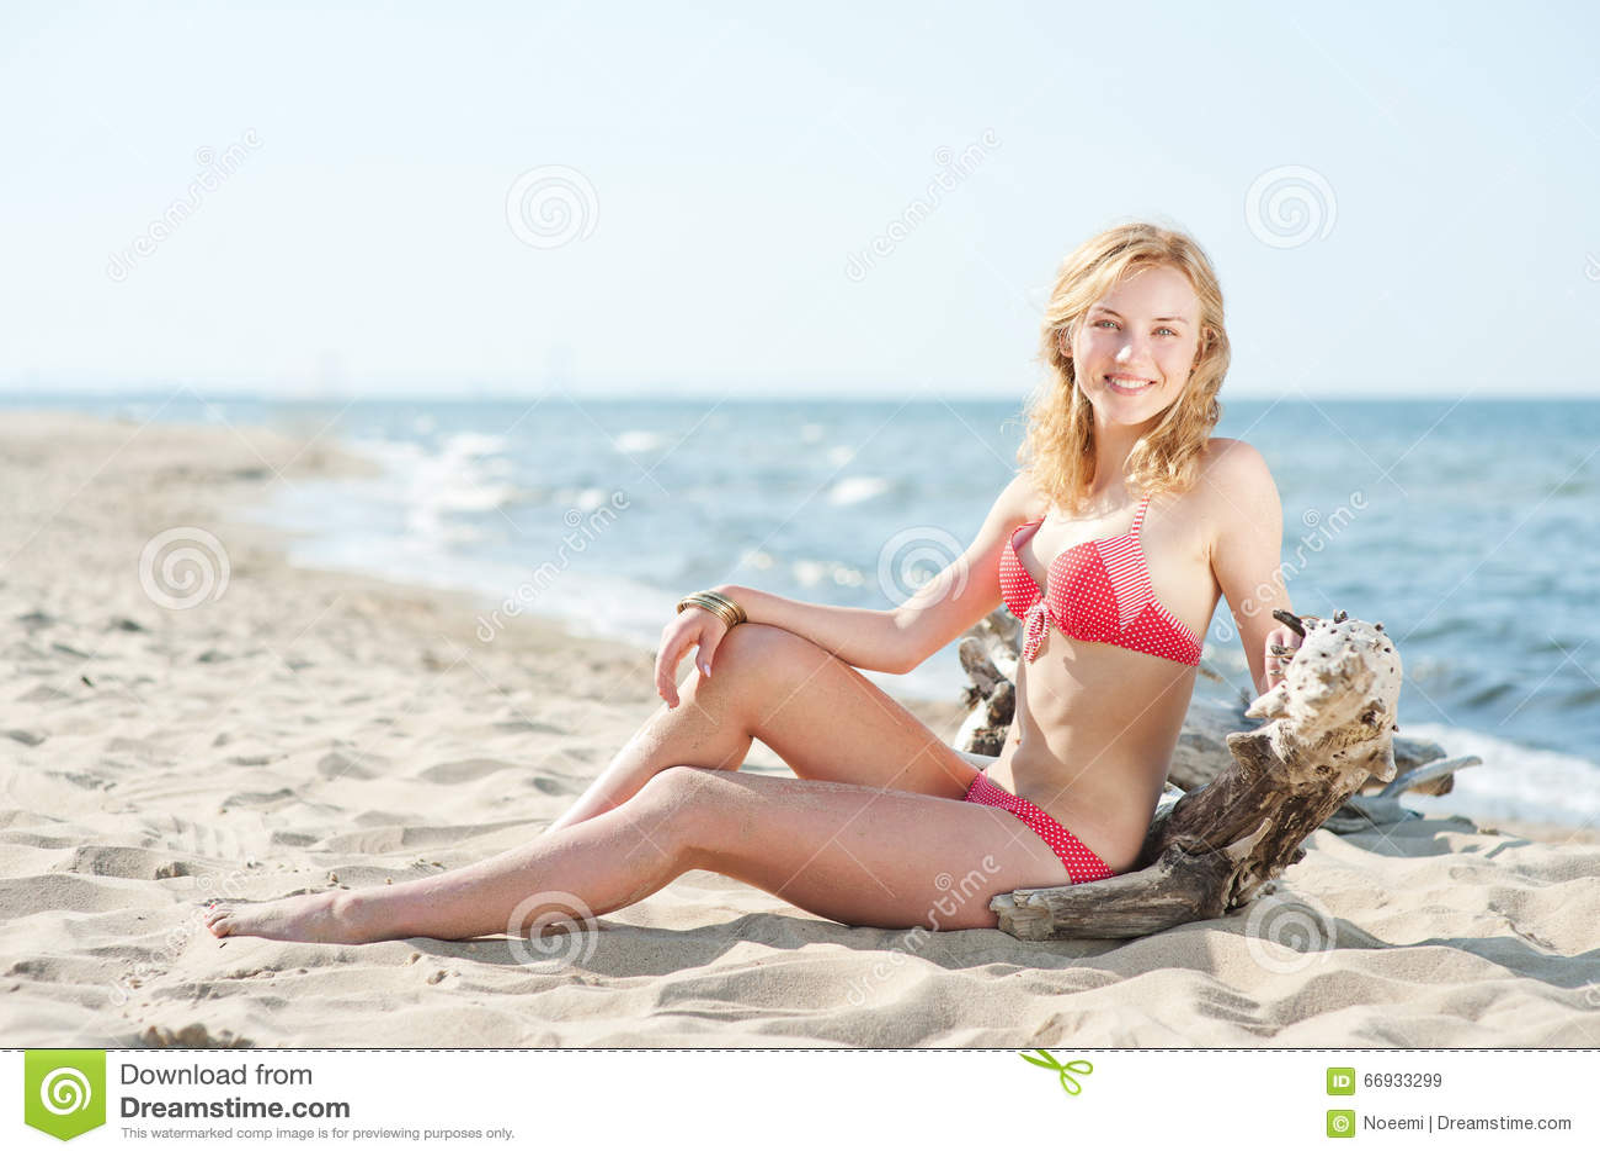 Beutiful young blond woman sunbatching on a beach